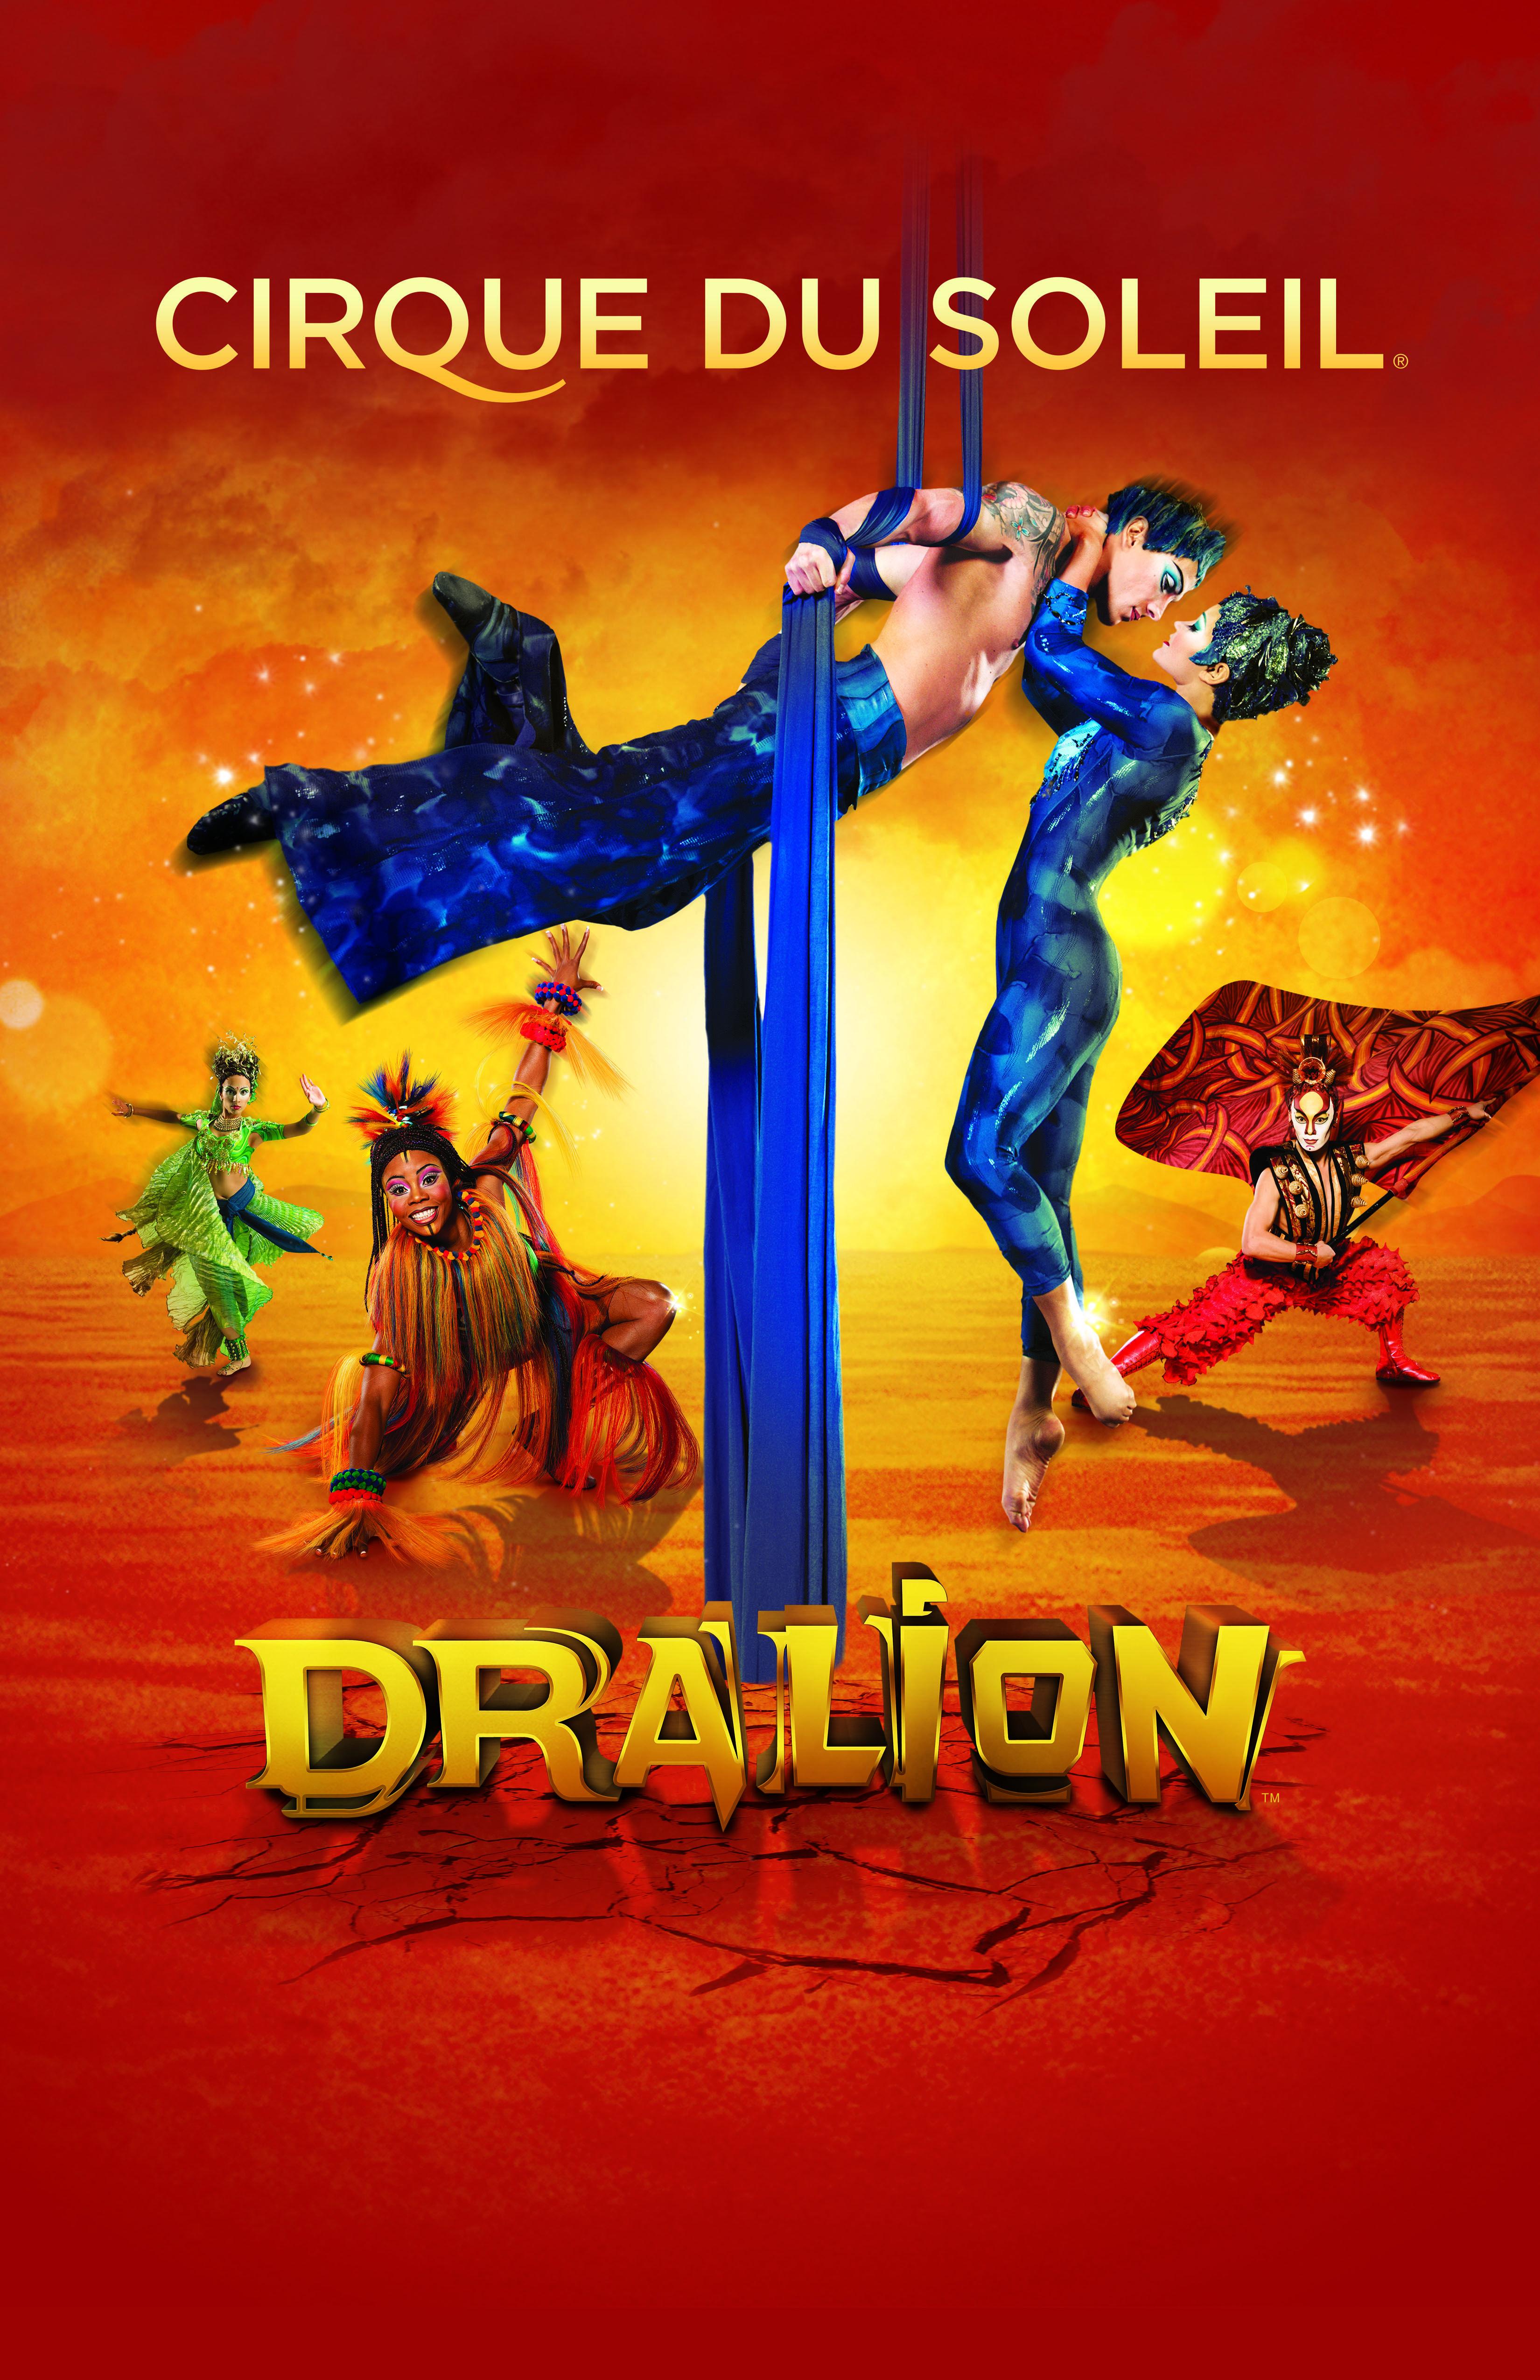 Amazing acrobatics from the Worldfamous Cirque du Soleil